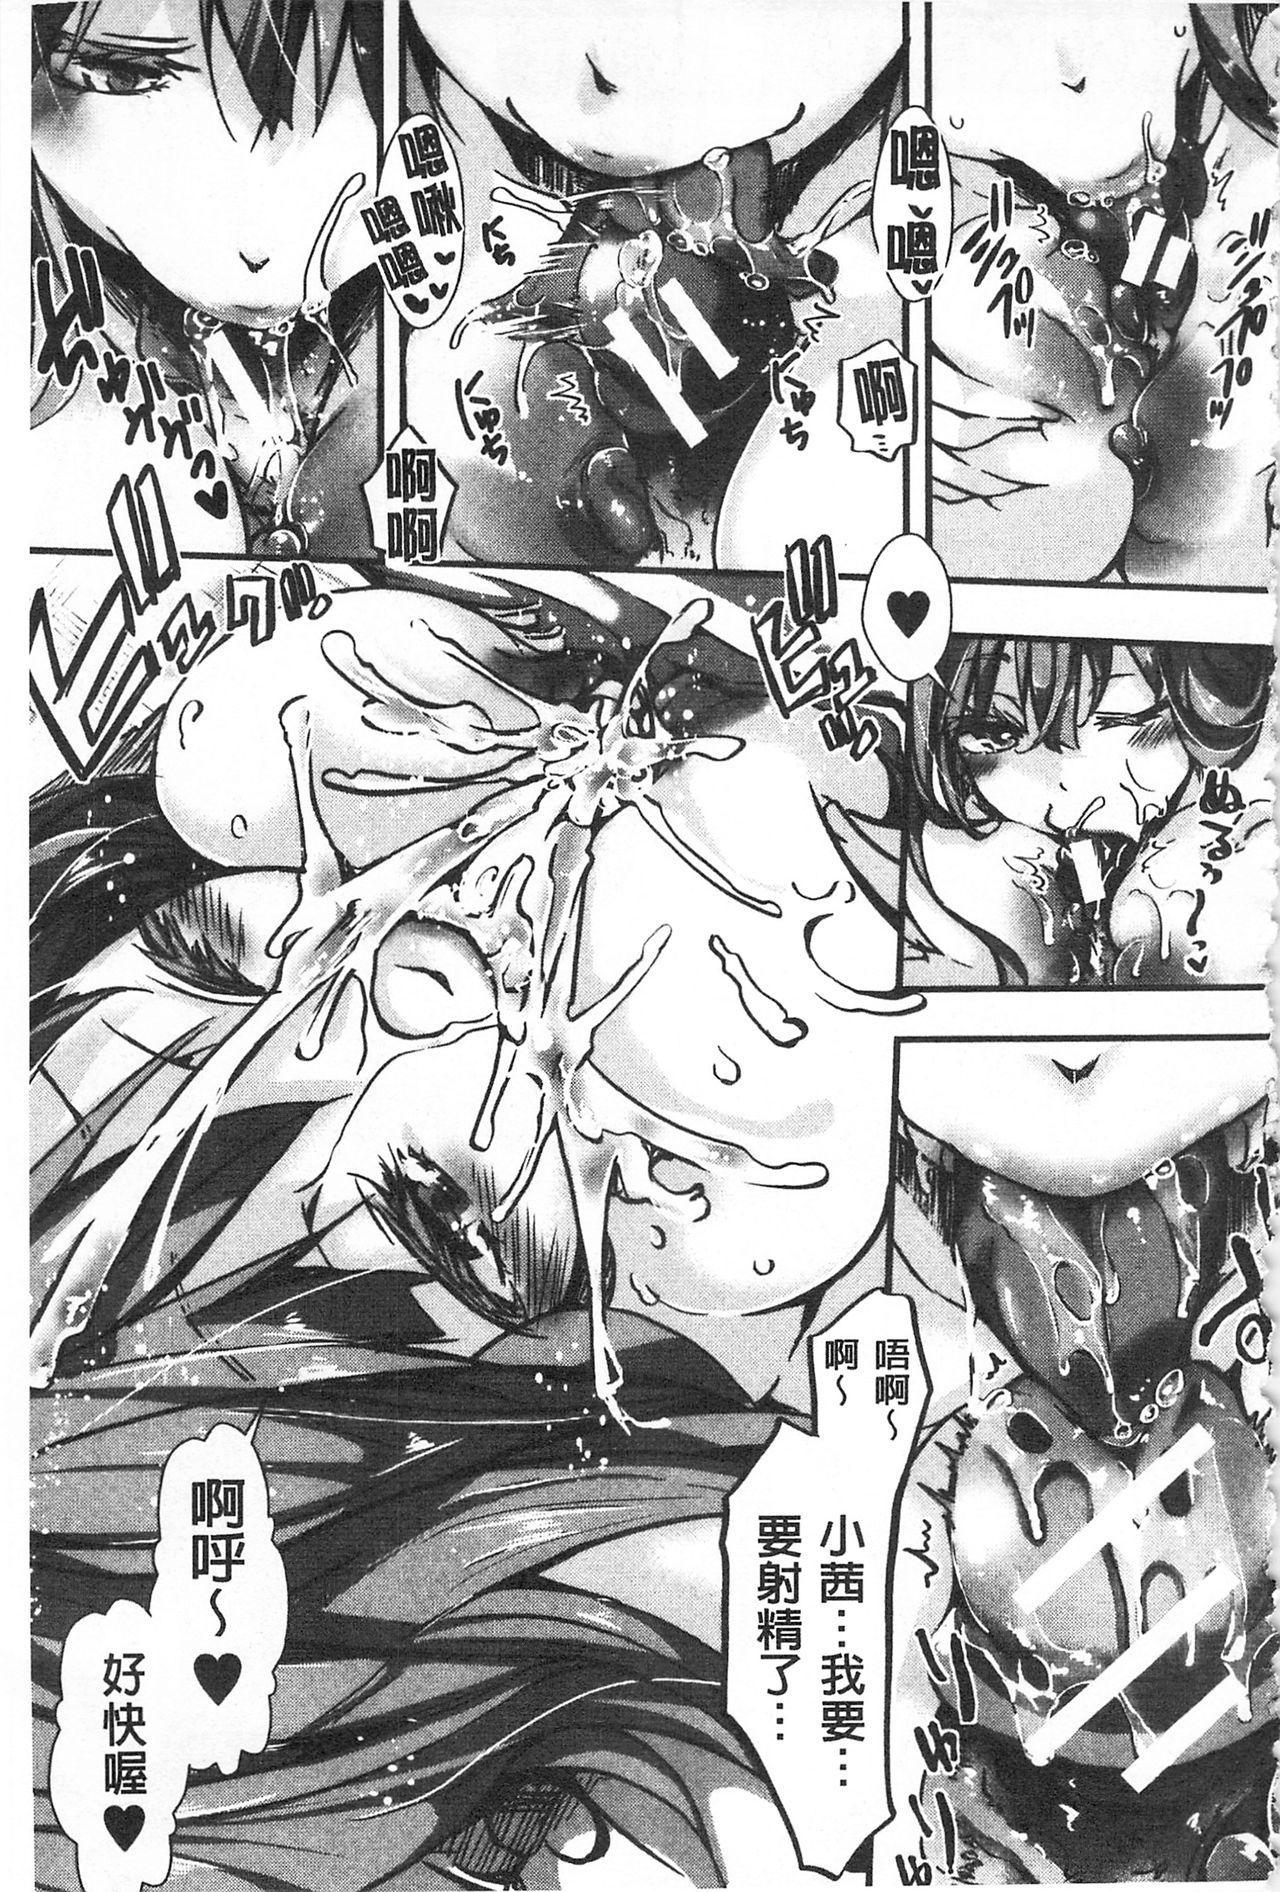 [hal] Daienjou -Ikare Ikasare Iki Ikare-   ∞艶嬢 -洩出來被搞到洩掛了被搞掛-  [Chinese] 40